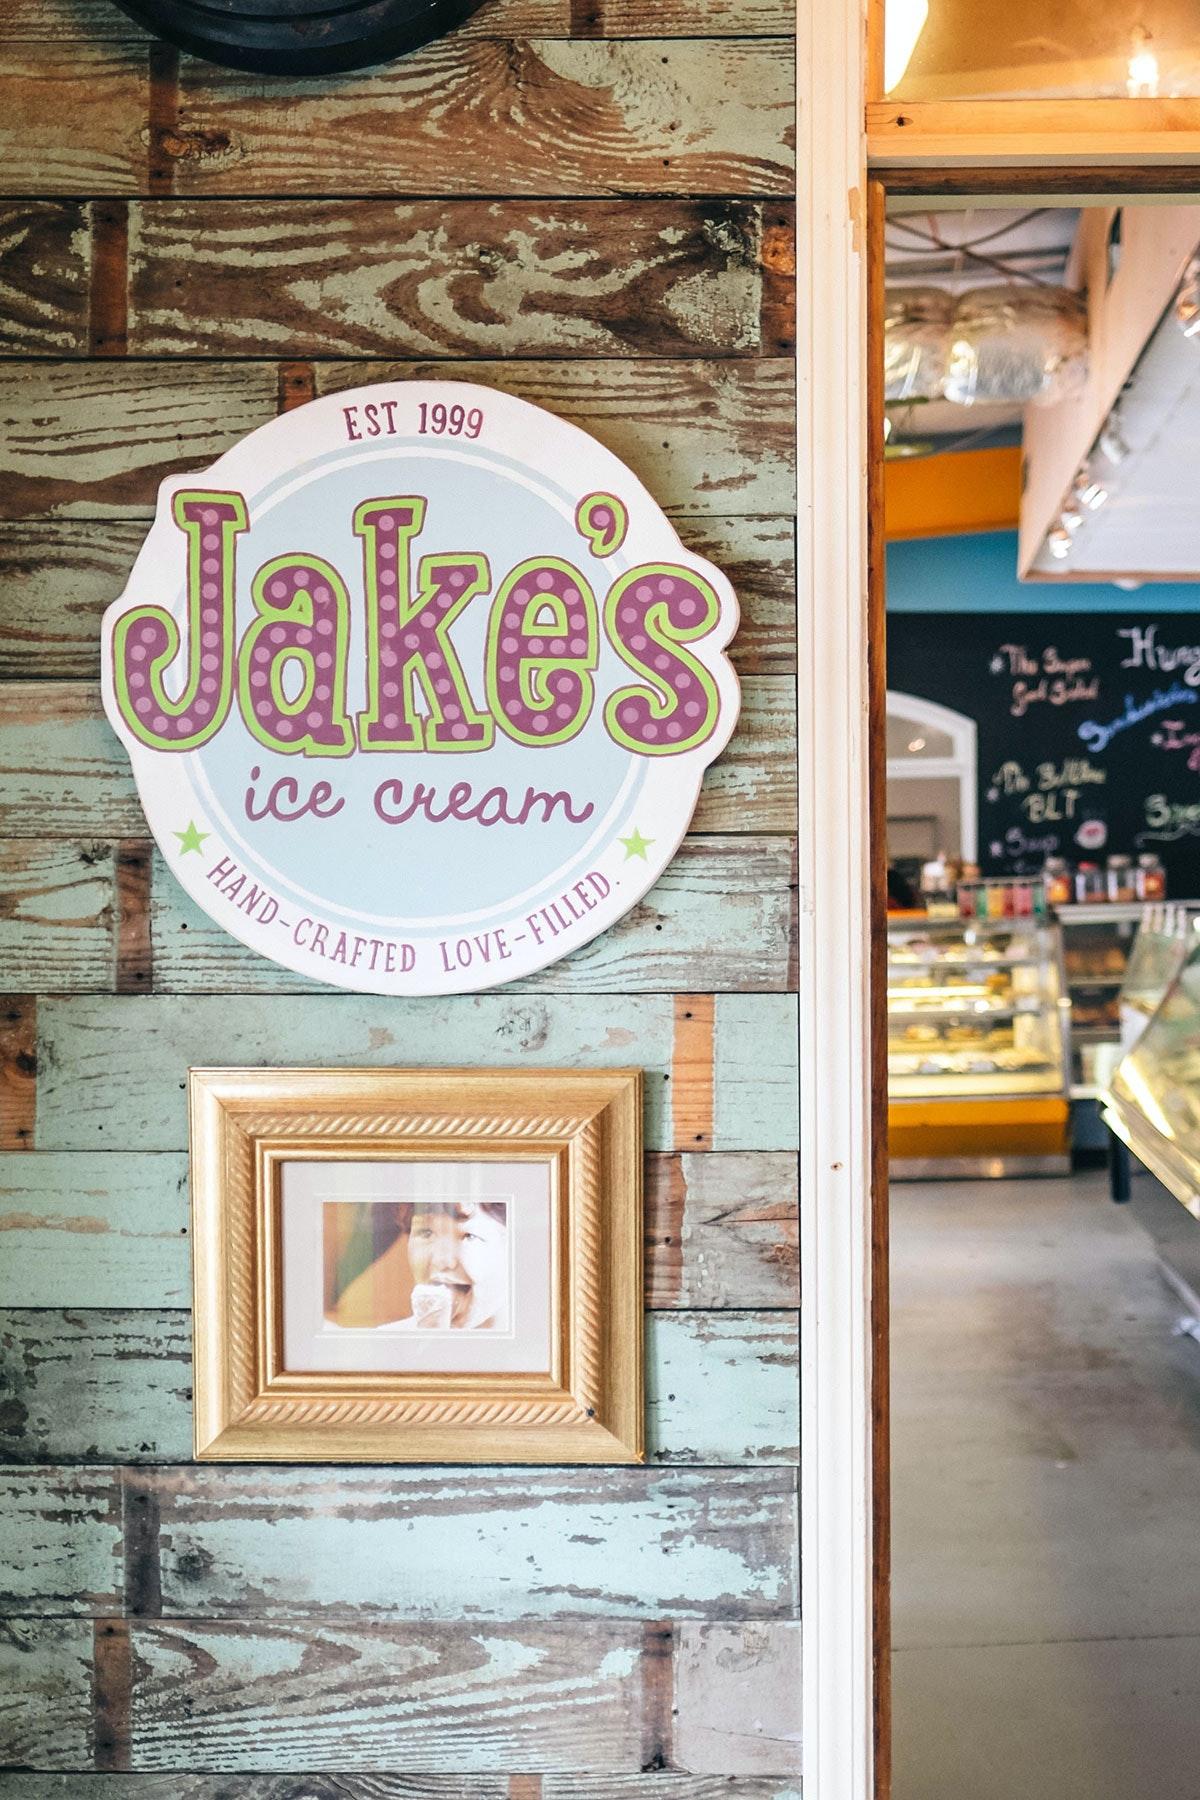 Jake's Ice Cream